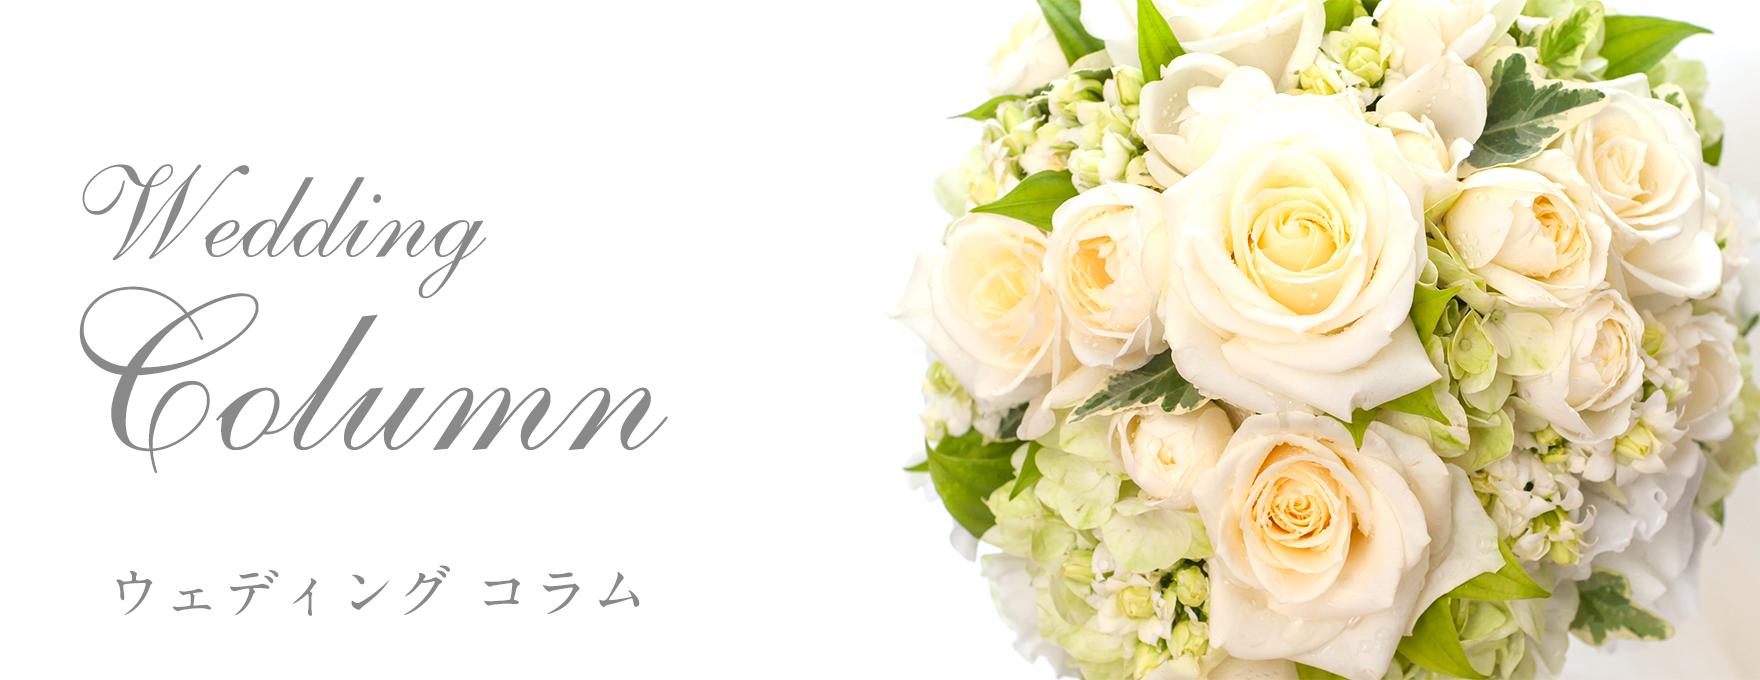 wedding_column